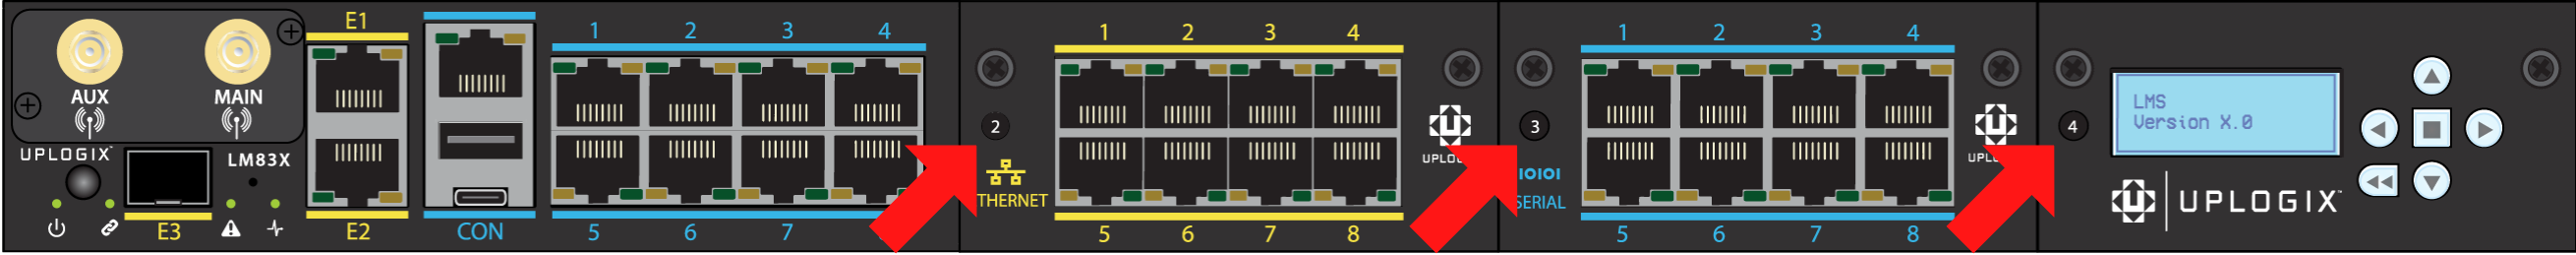 Uplogix LM83X Slot Number Pass-throughs